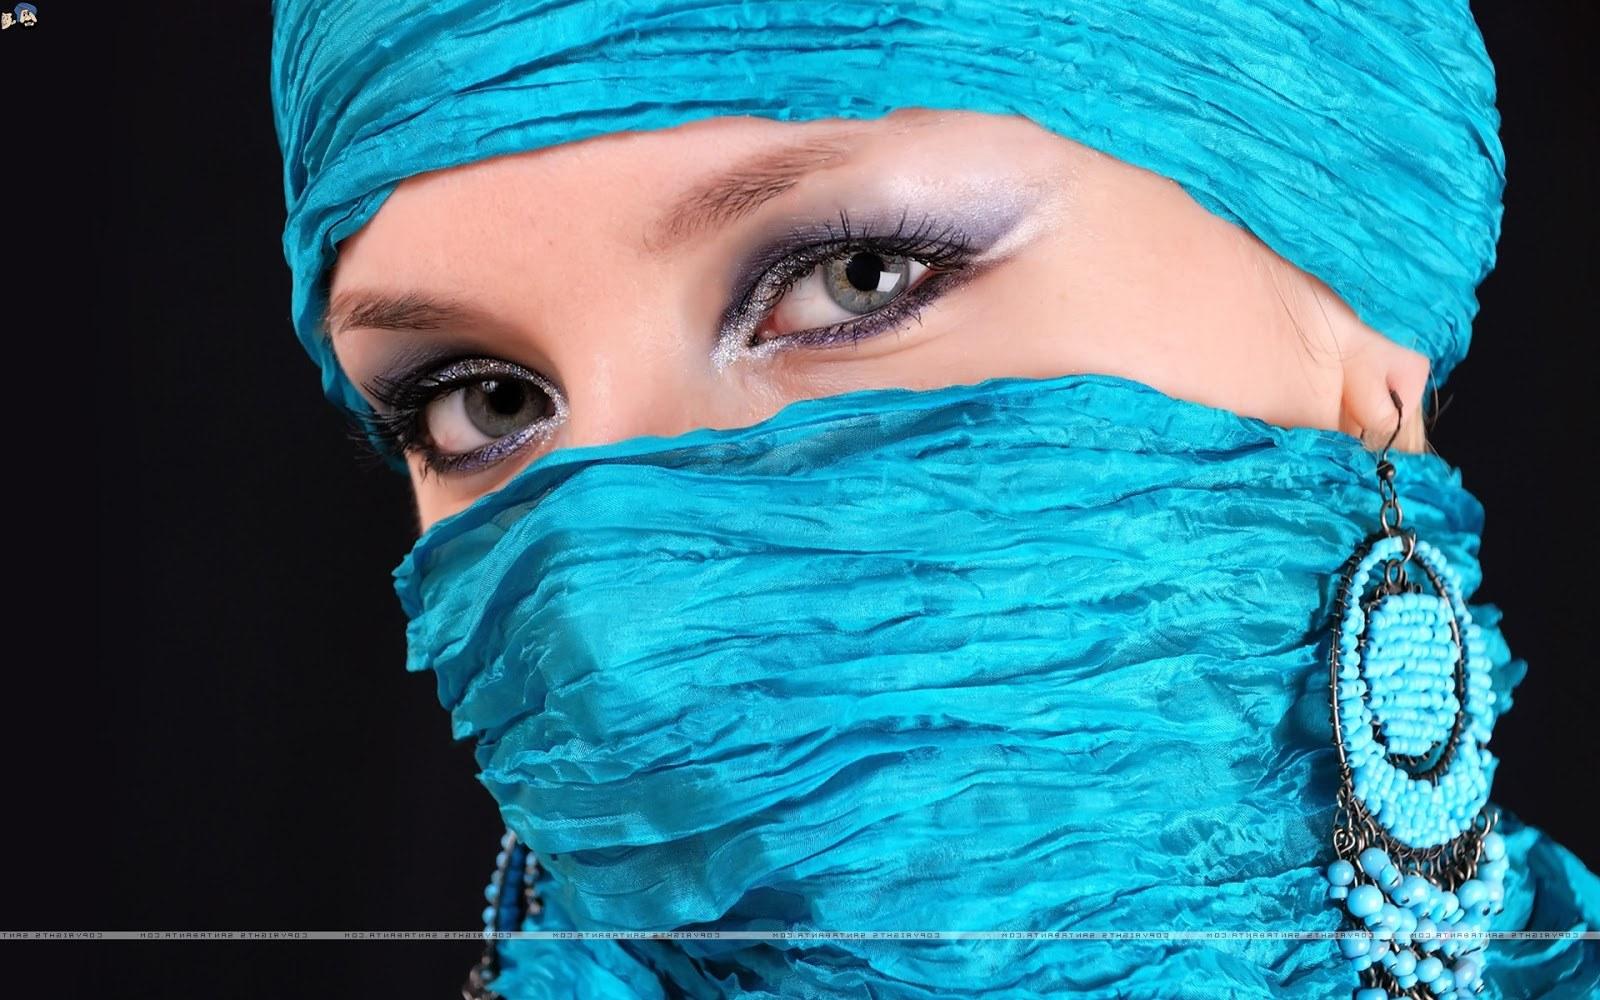 Ide Muslimah Bercadar D0dg Koleksi Wallpaper Wanita Muslimah Bercadar